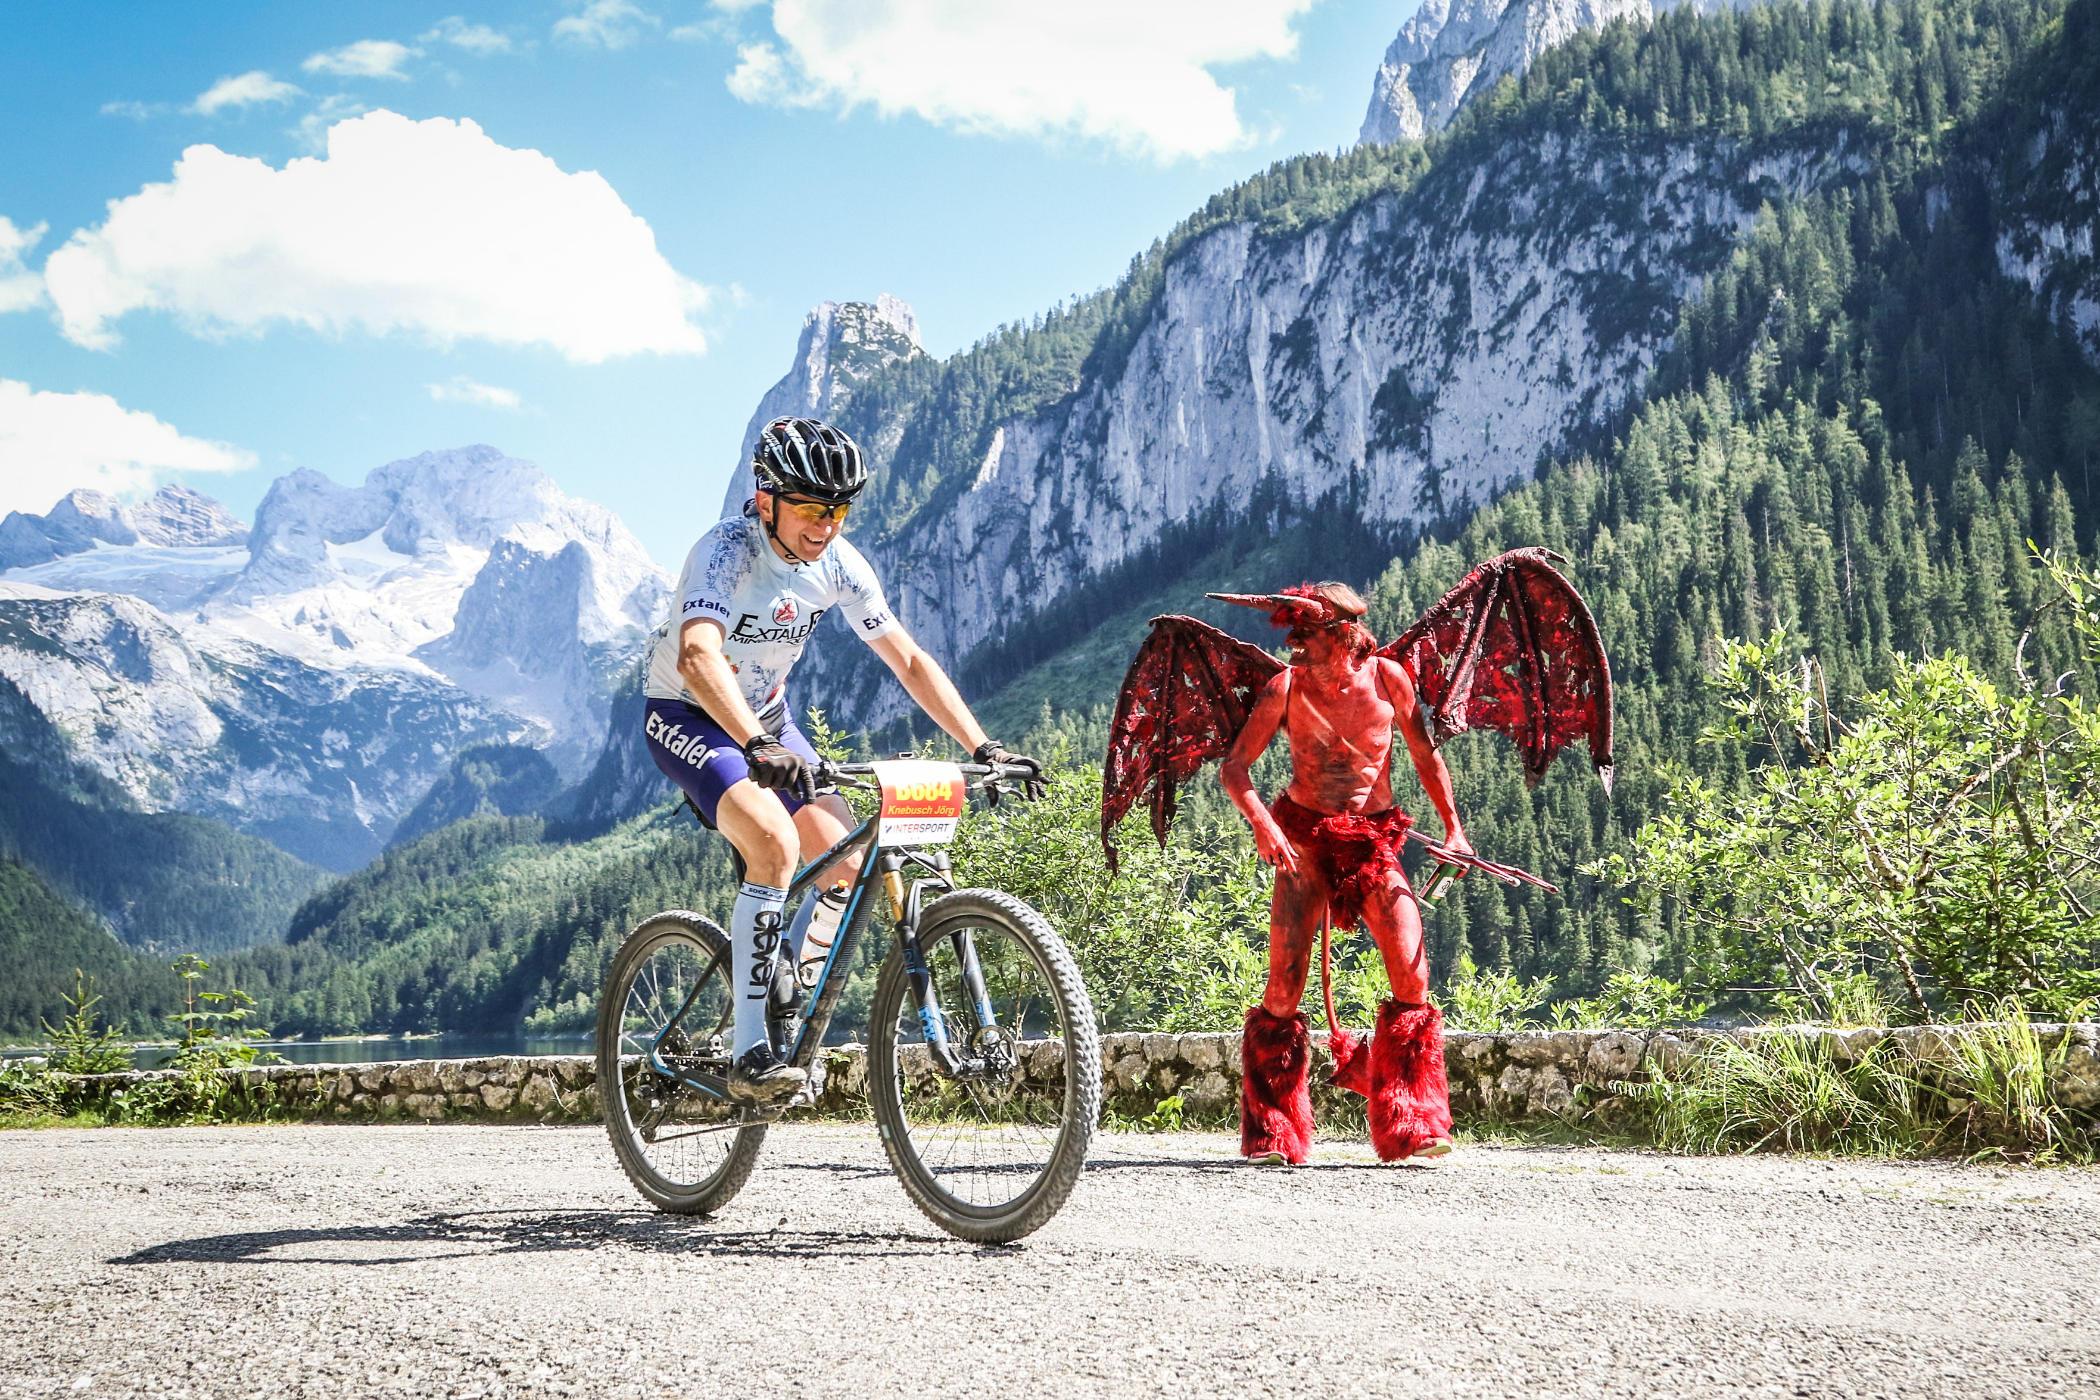 8000_salzkammergut_mountainbike_trophy_marathon_gosausee_teufel_sportograf.jpg